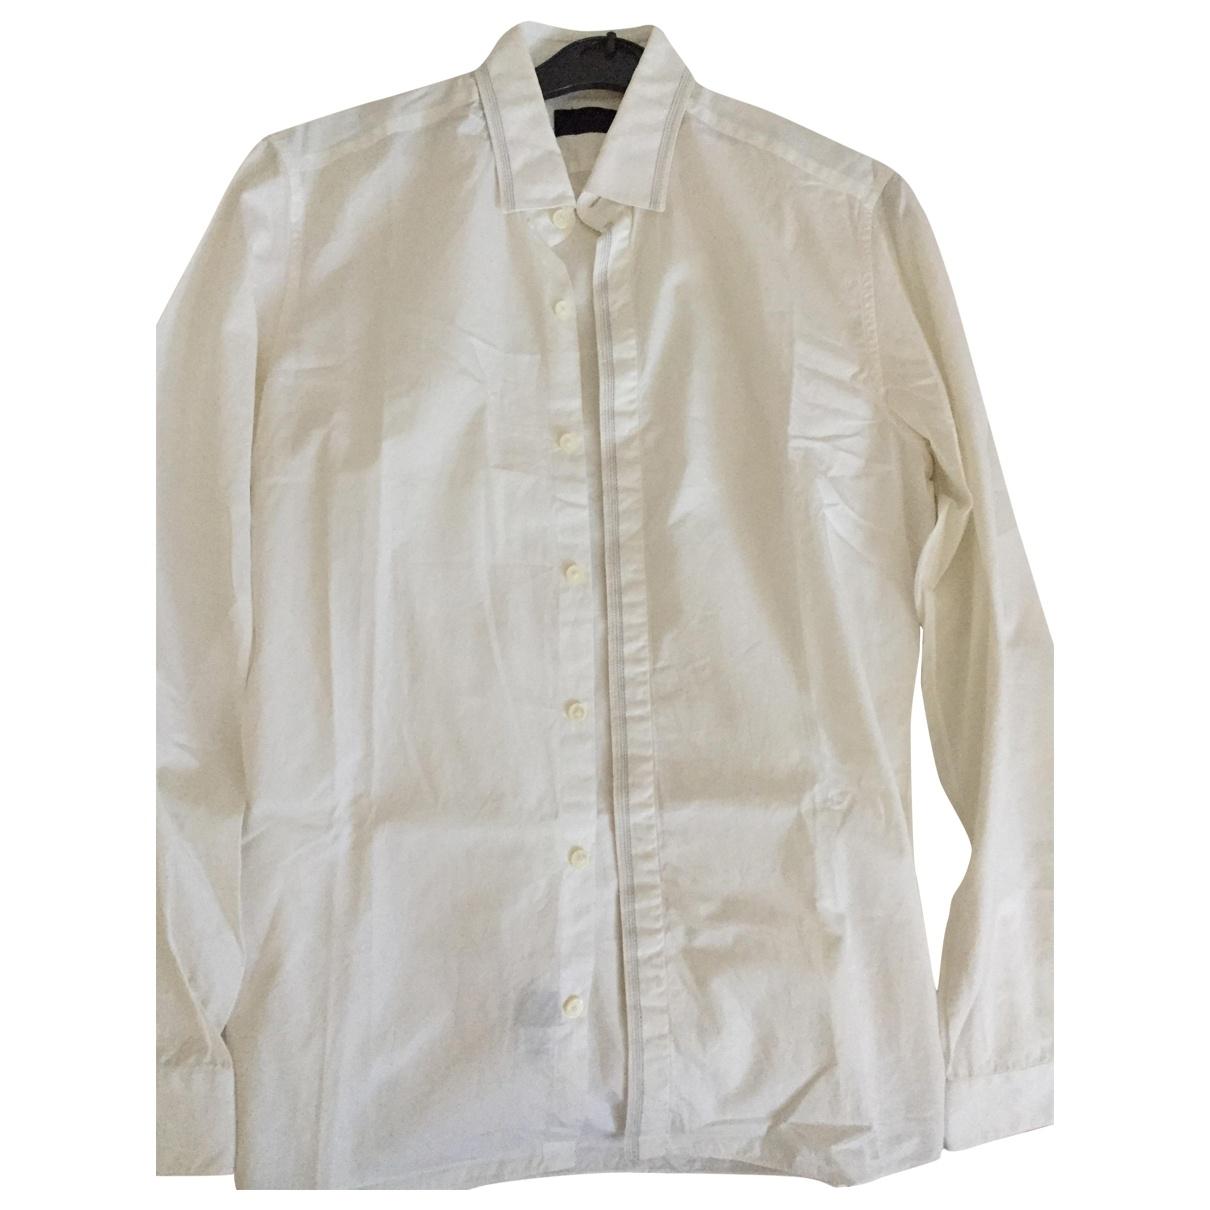 Lanvin \N Ecru Cotton Shirts for Men 38 EU (tour de cou / collar)